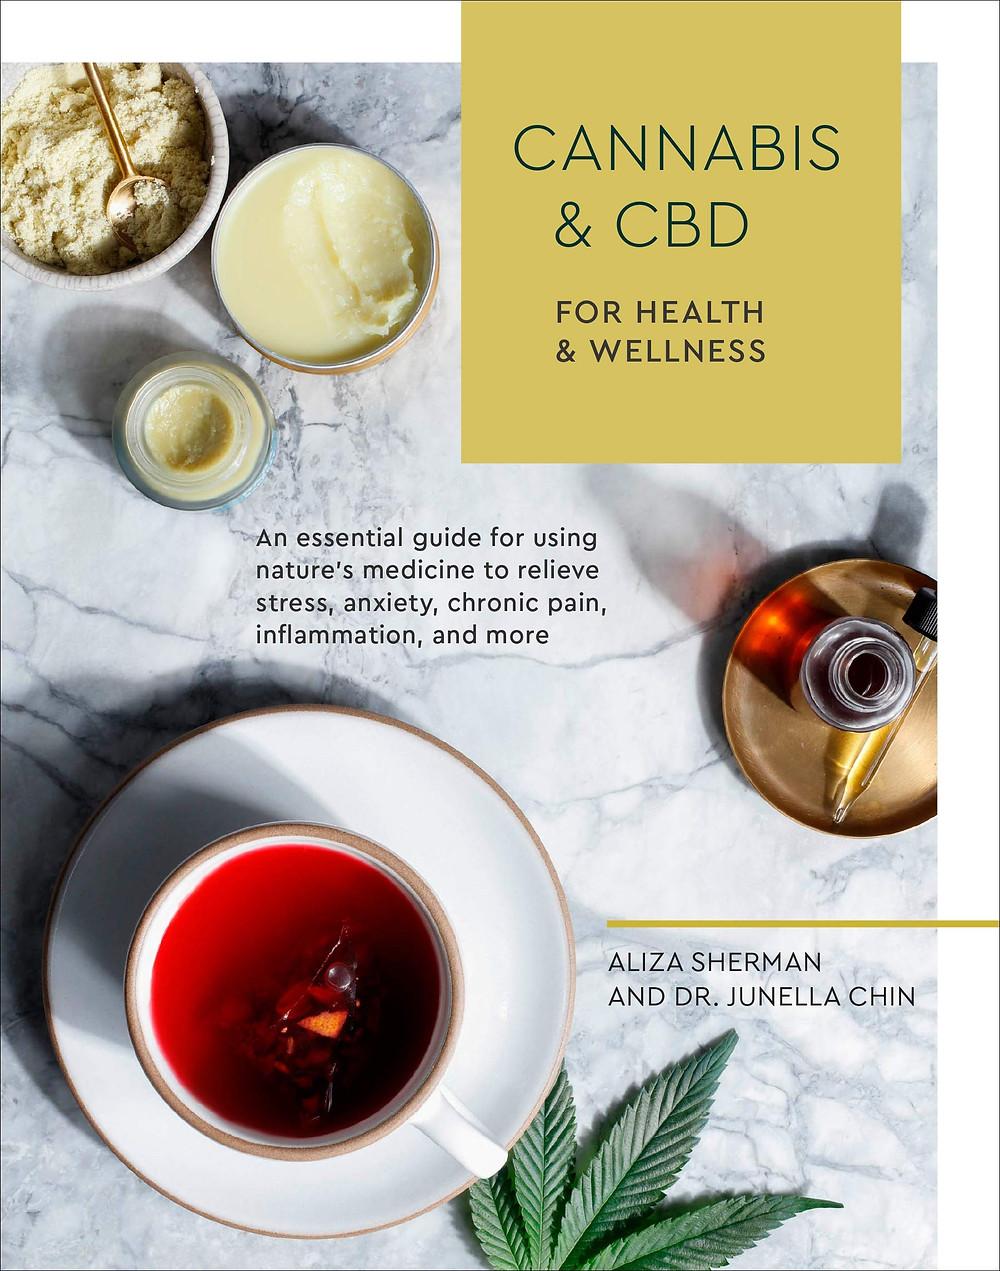 Cannabis & CBD For Health & Wellness Book Cover